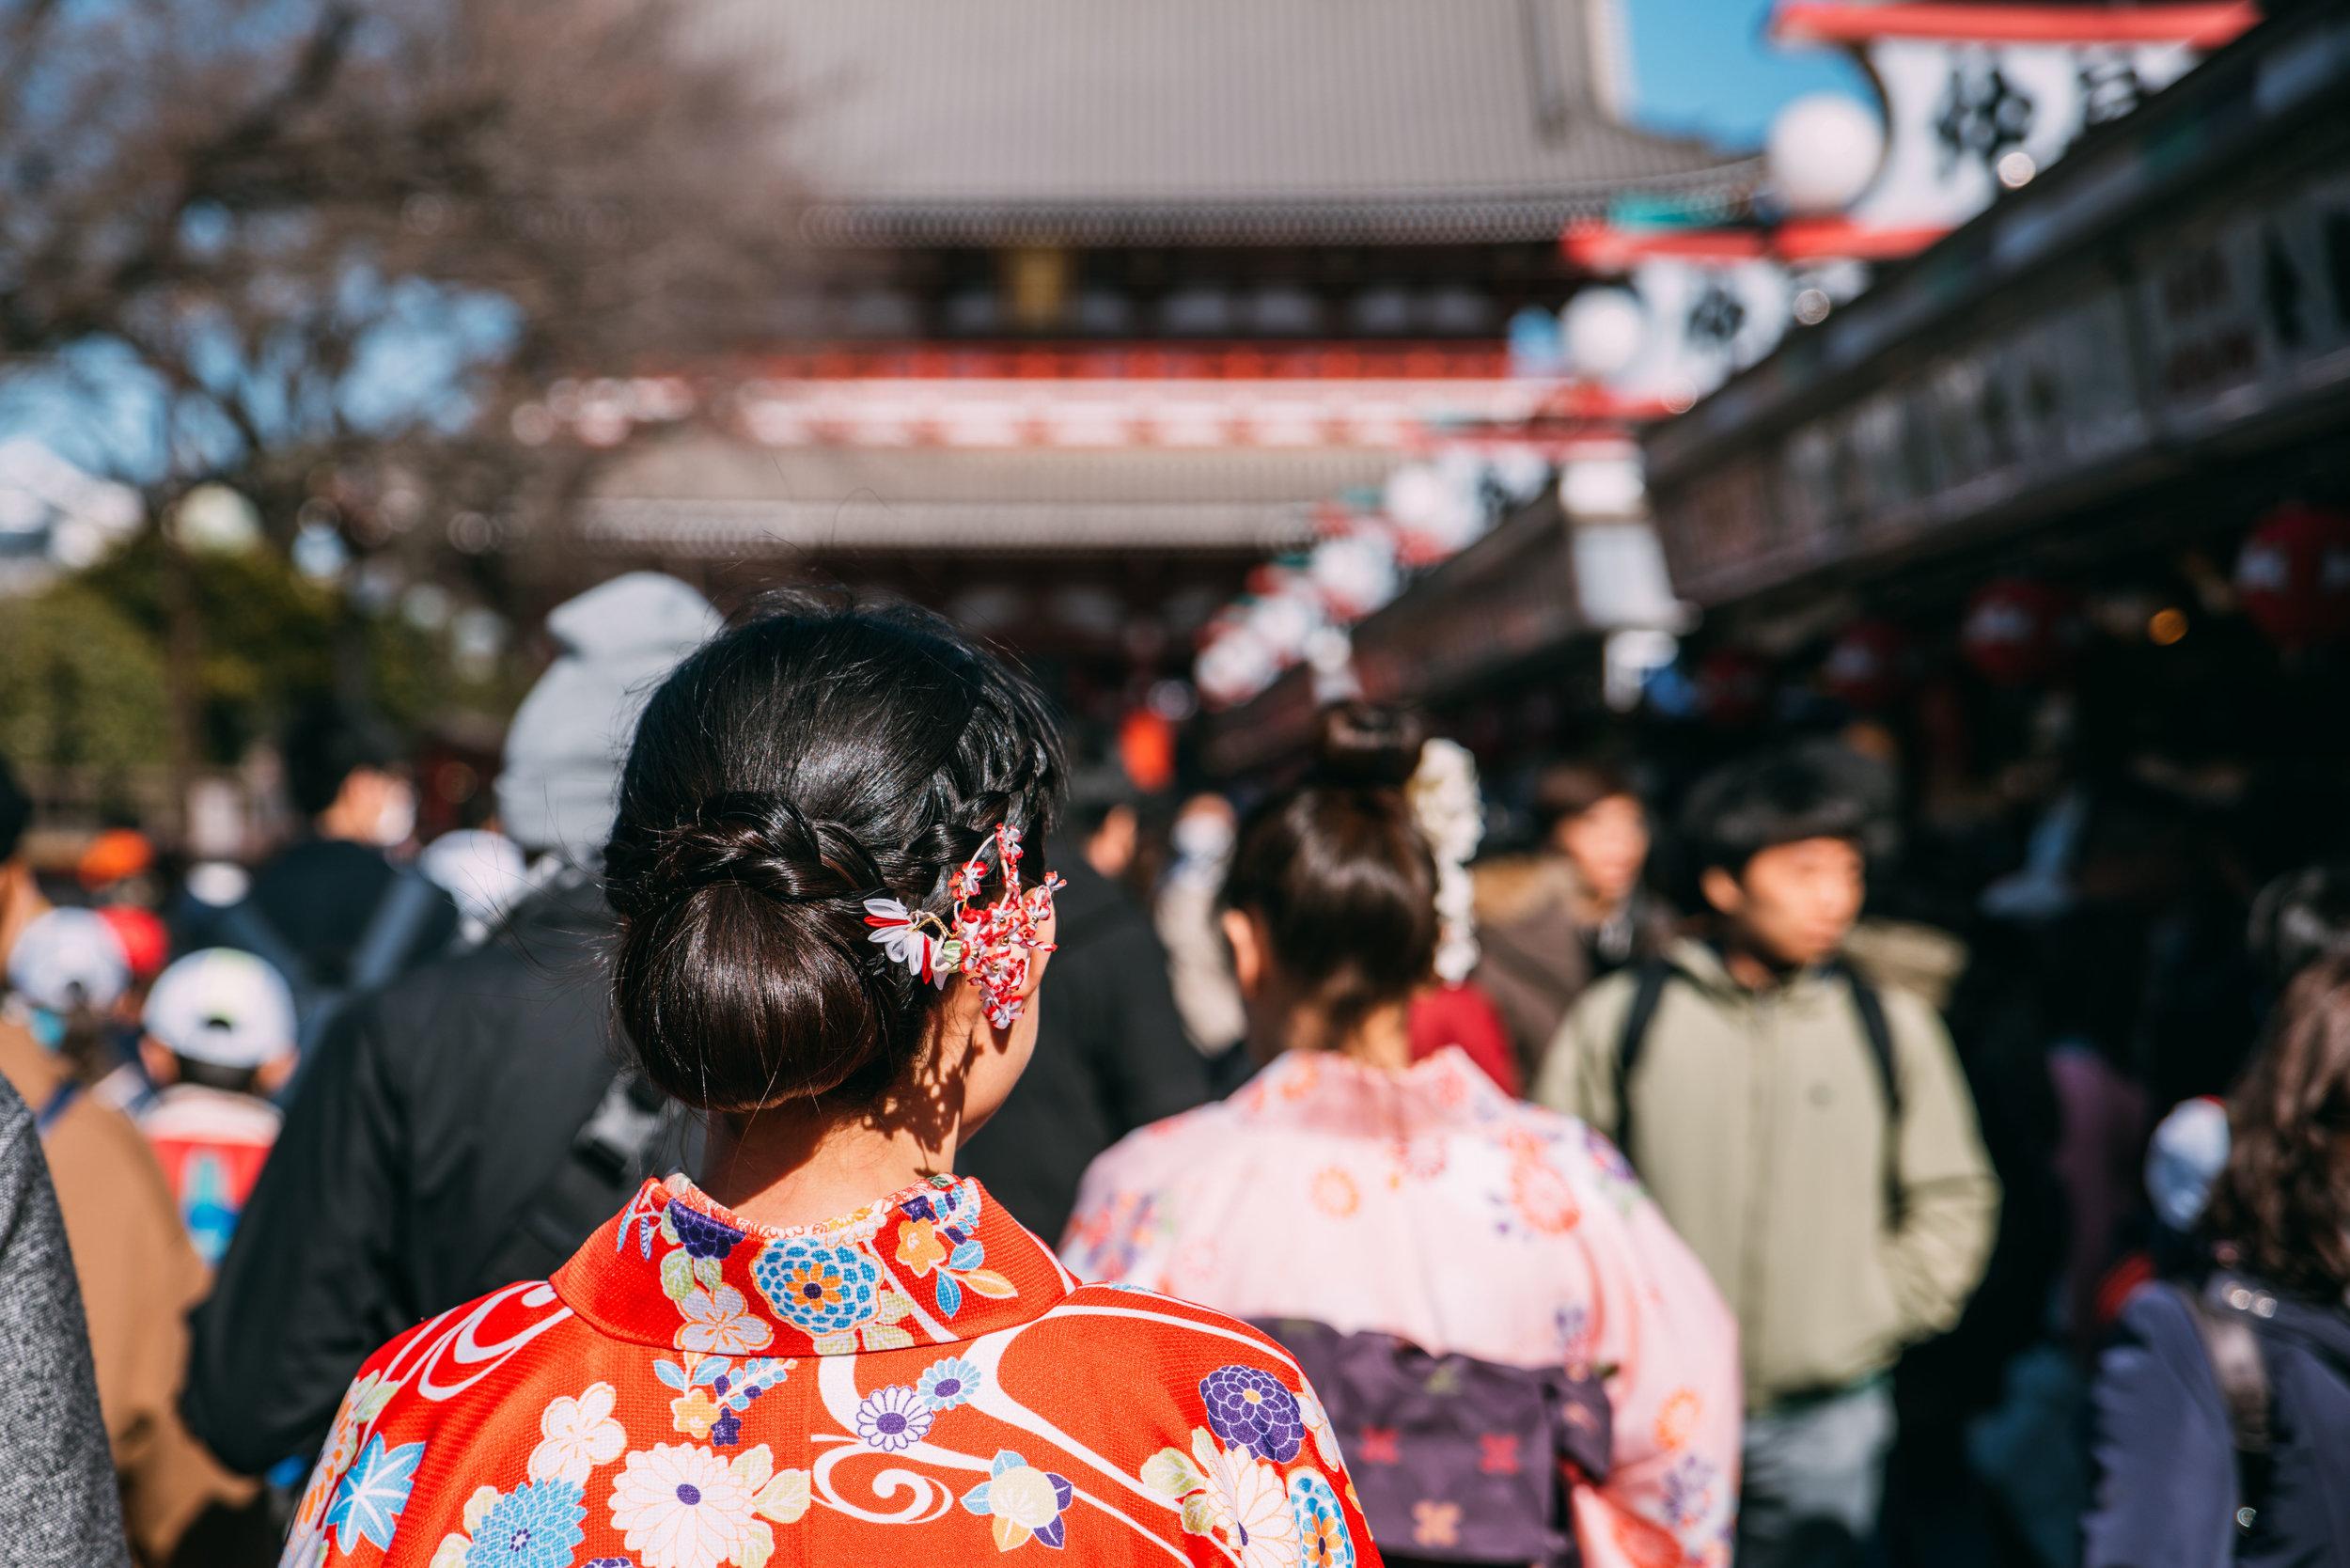 asakusa-street-photography_DSC3952.jpg